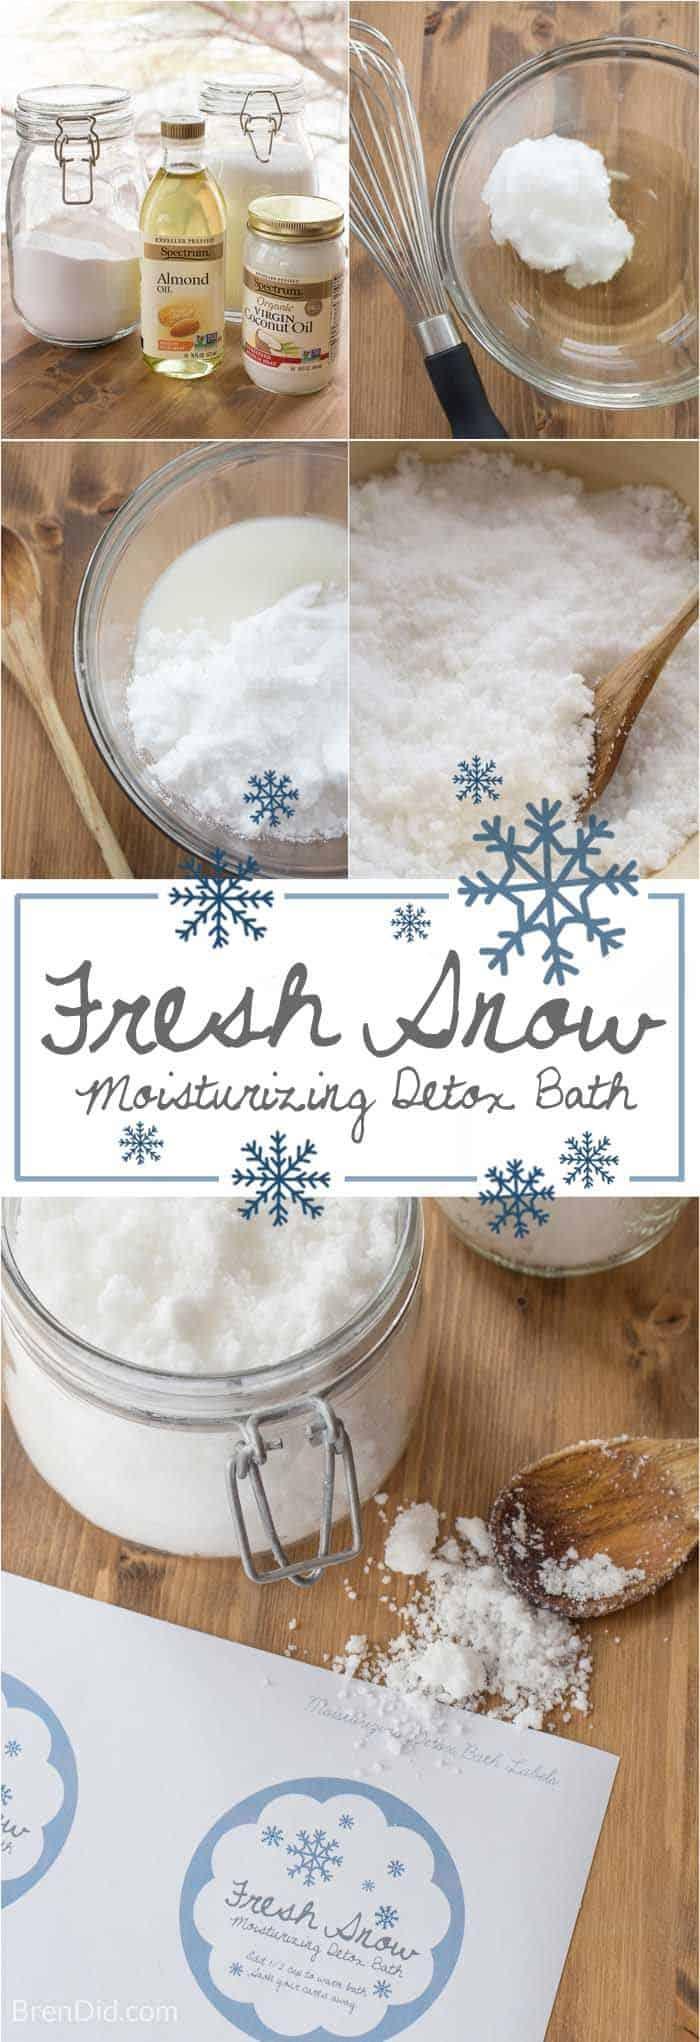 Fresh snow moisturizing detox bath